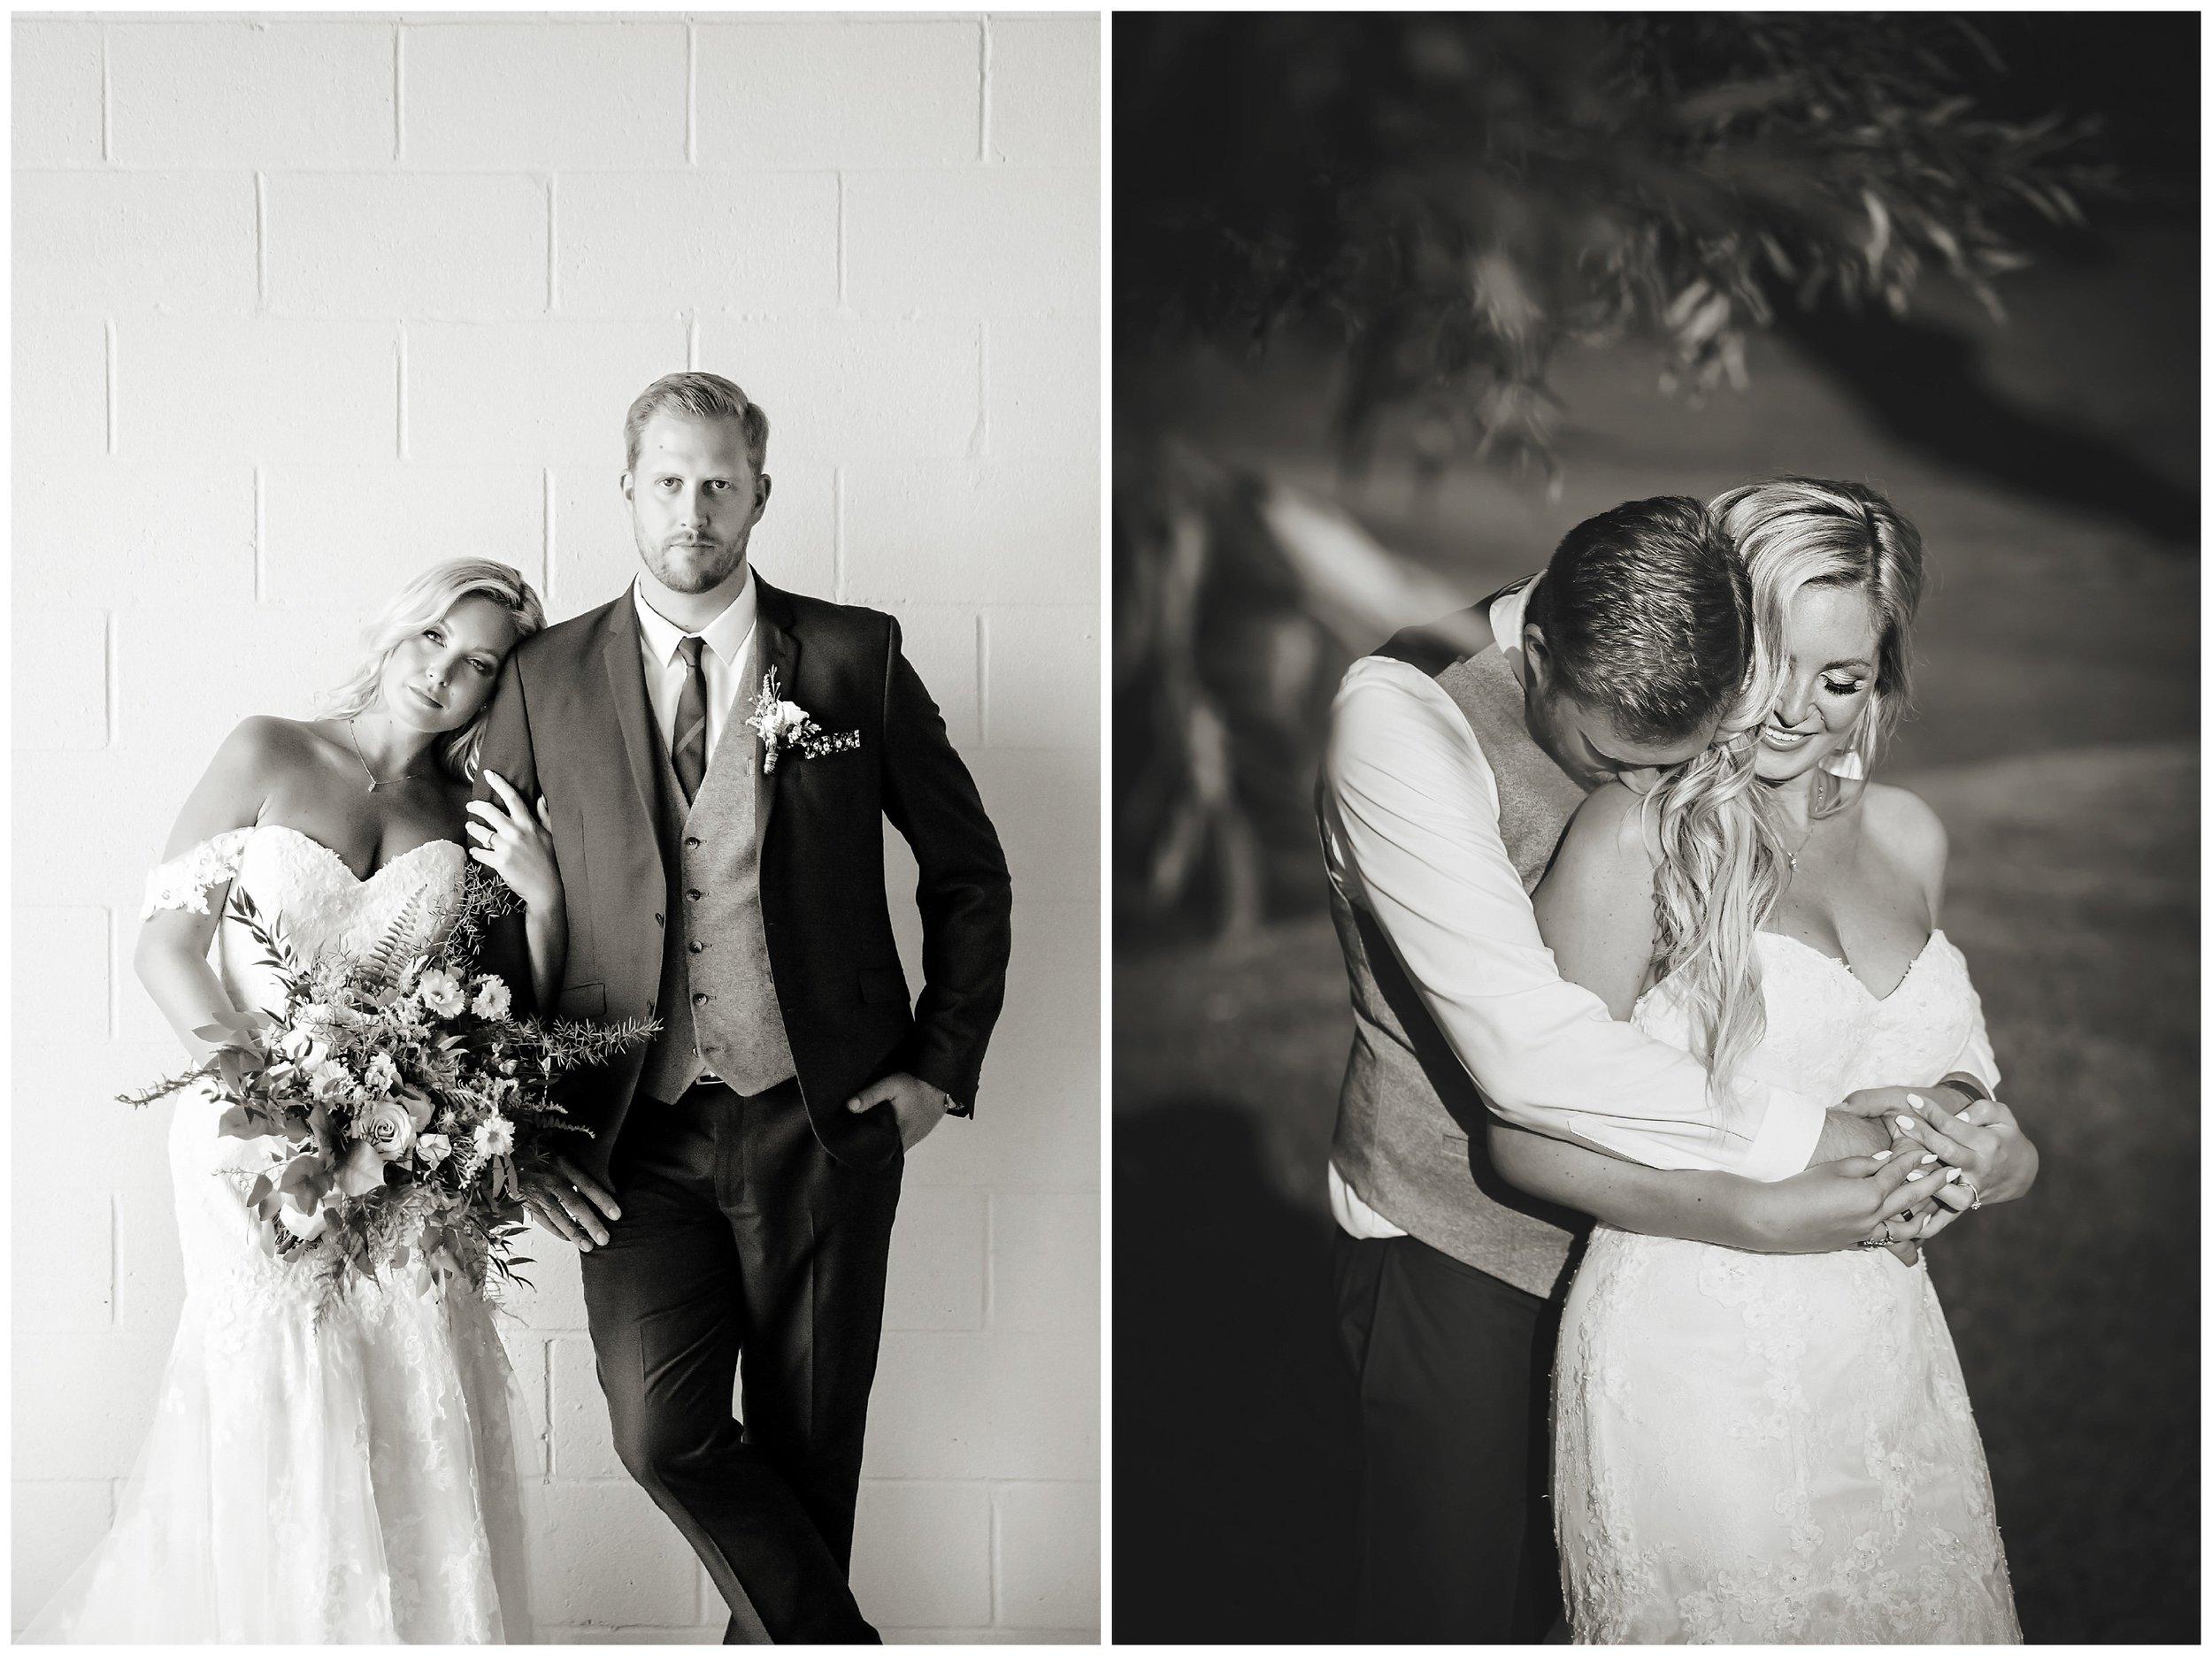 VanDaele-Russell-Wedding-Photography-London-Toronto-Ontario_0158.jpg